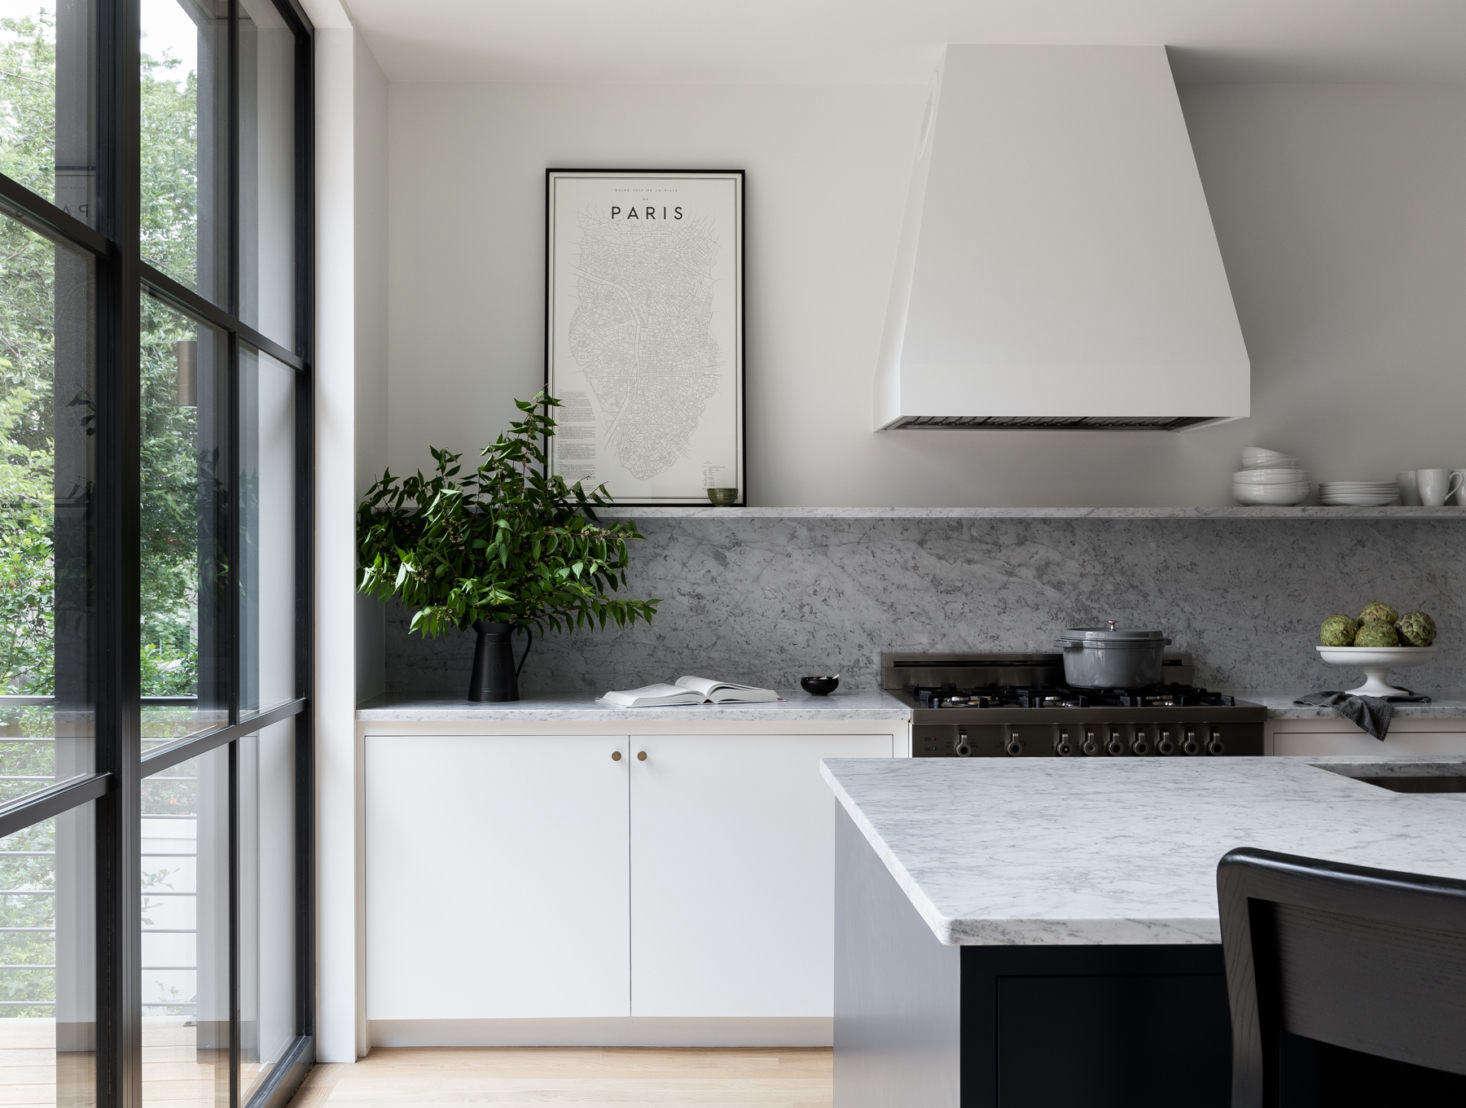 16 Favorite Solid Marble Kitchen Backsplashes For Maximum Drama Remodelista